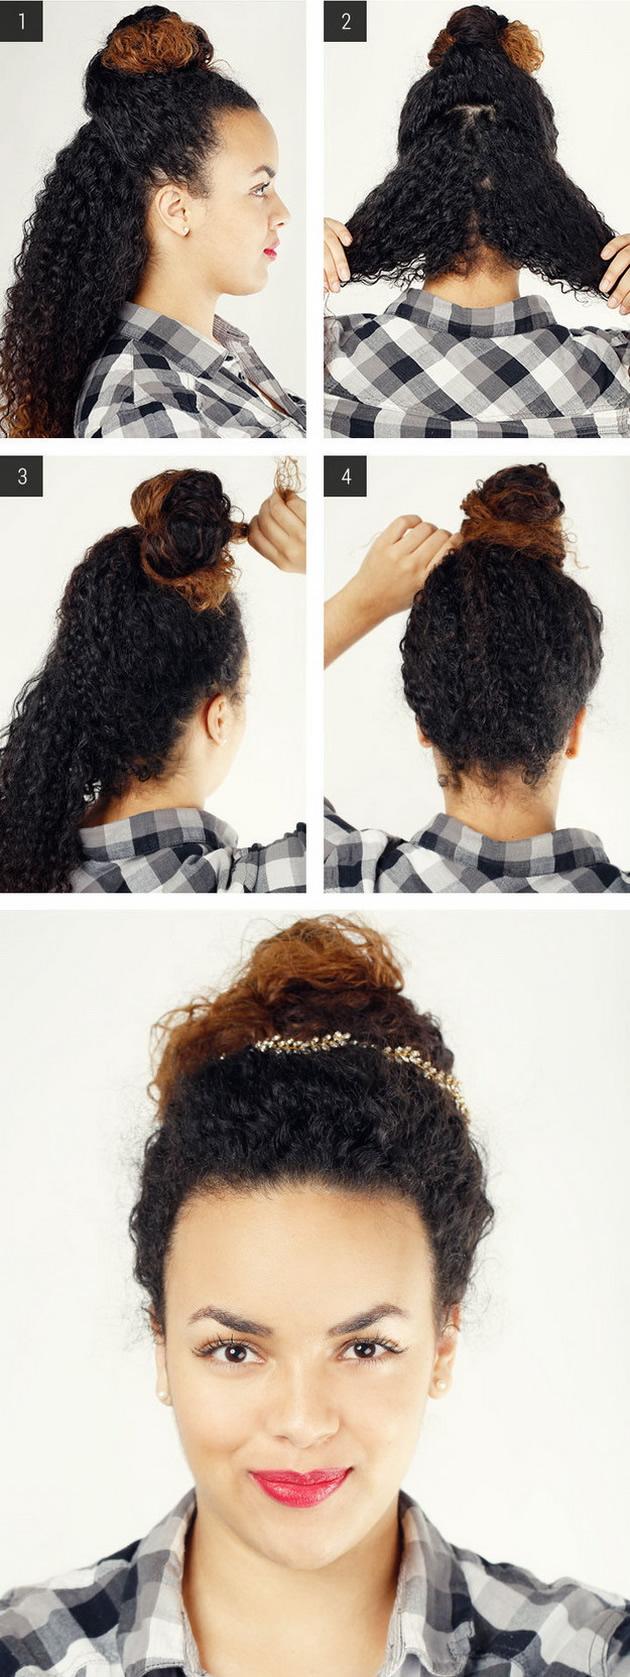 12-frizuri-za-devojkite-so-prirodno-vitkana-kosa-gotovi-za-5-minuti-9.jpg